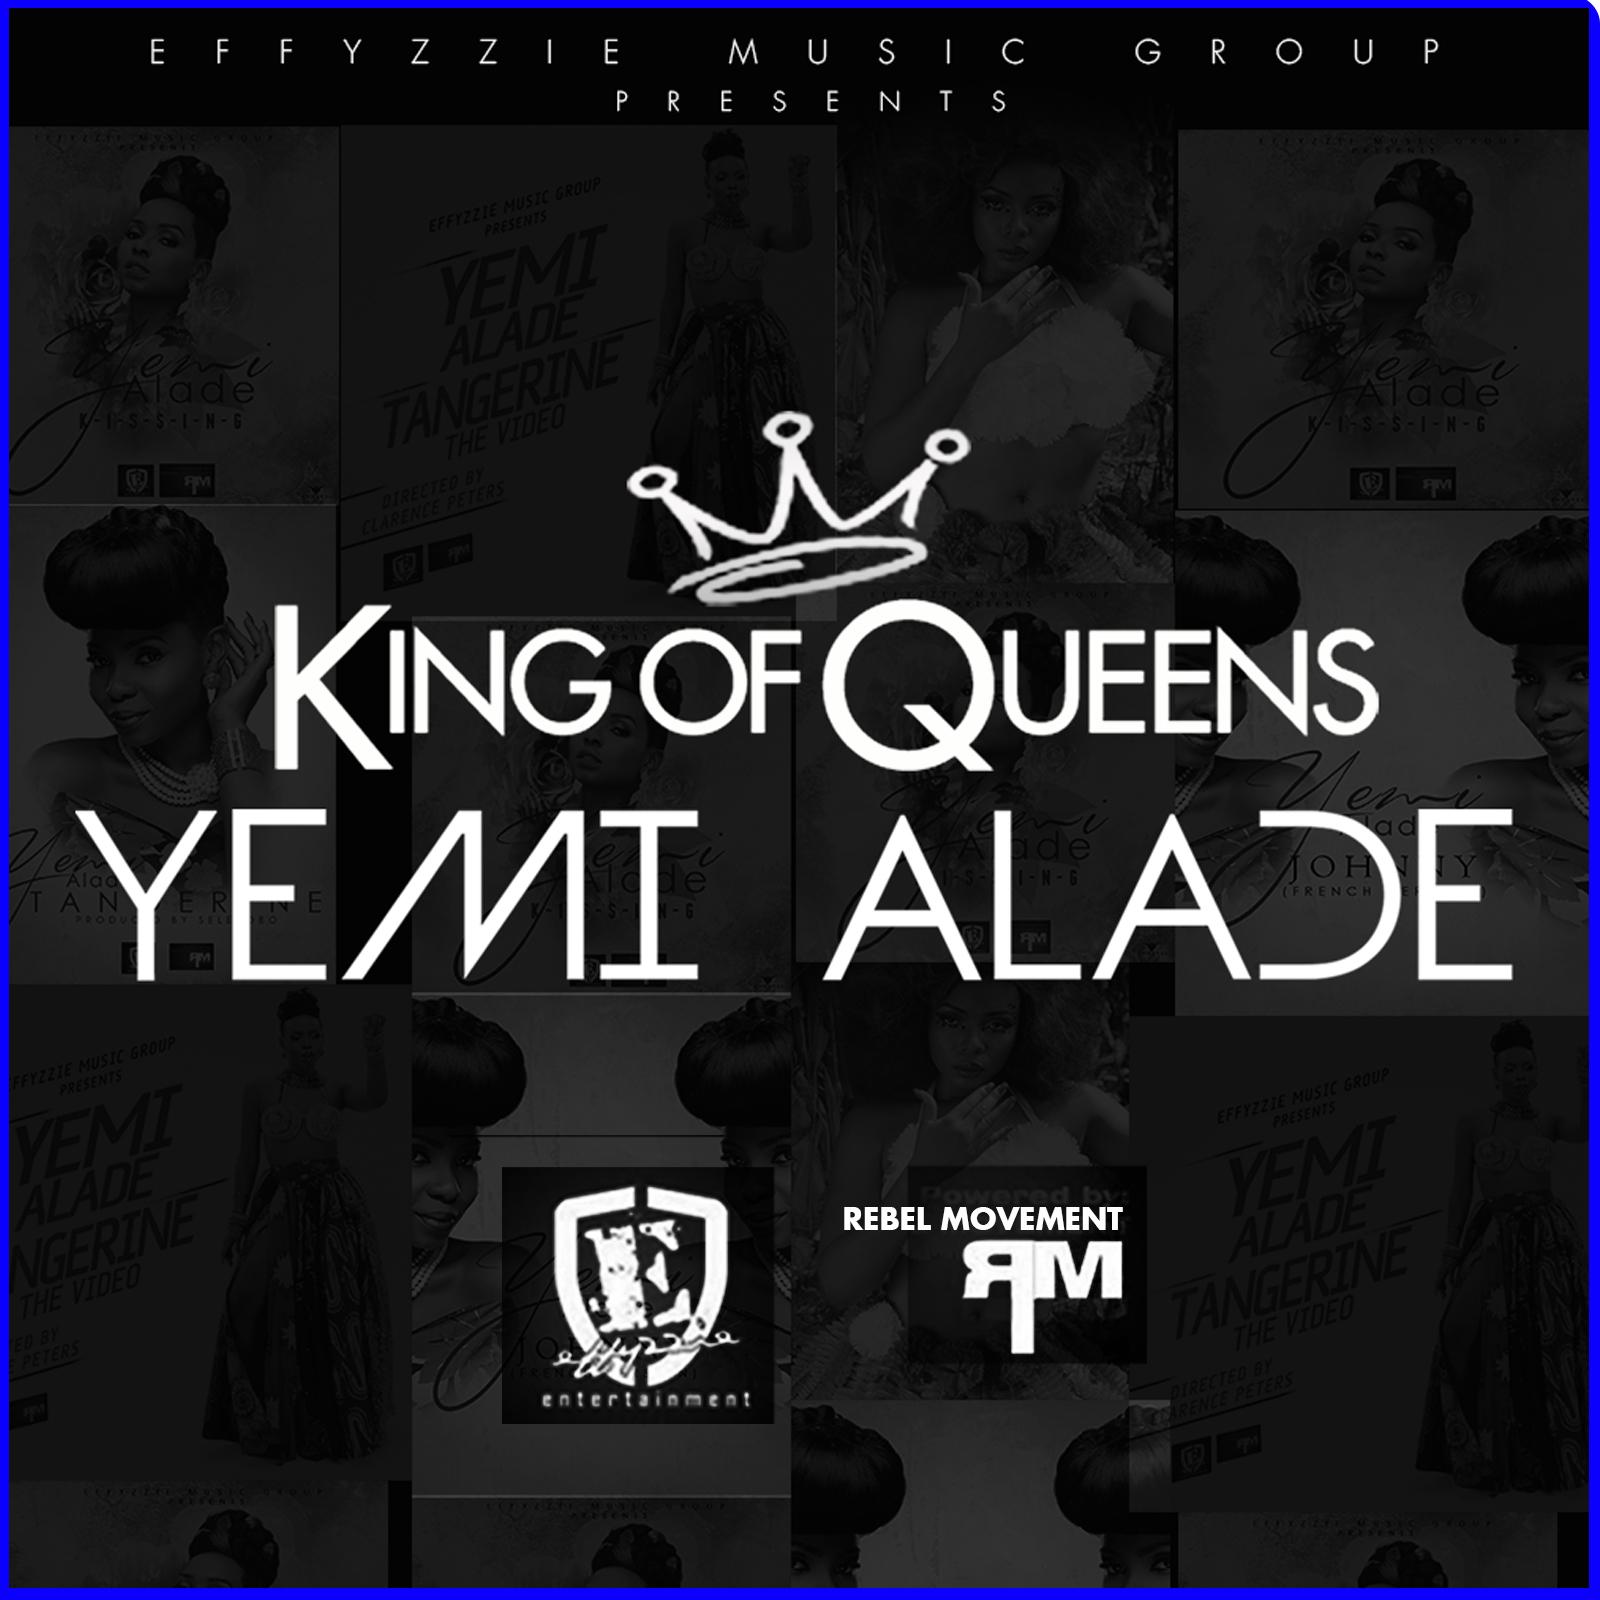 Yemi Alade #KOQ